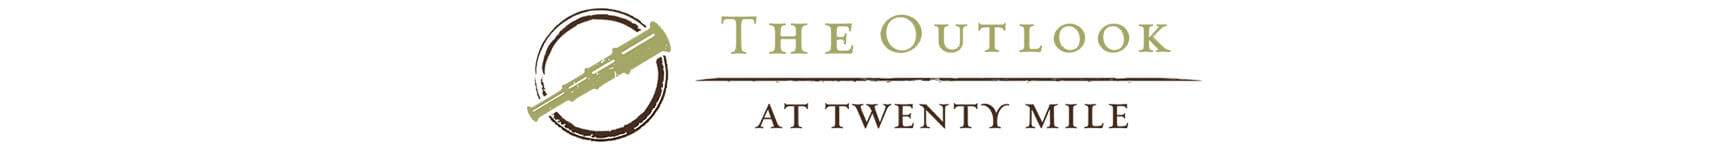 The-Outlook-at-Twenty-Mile-Banner.jpg